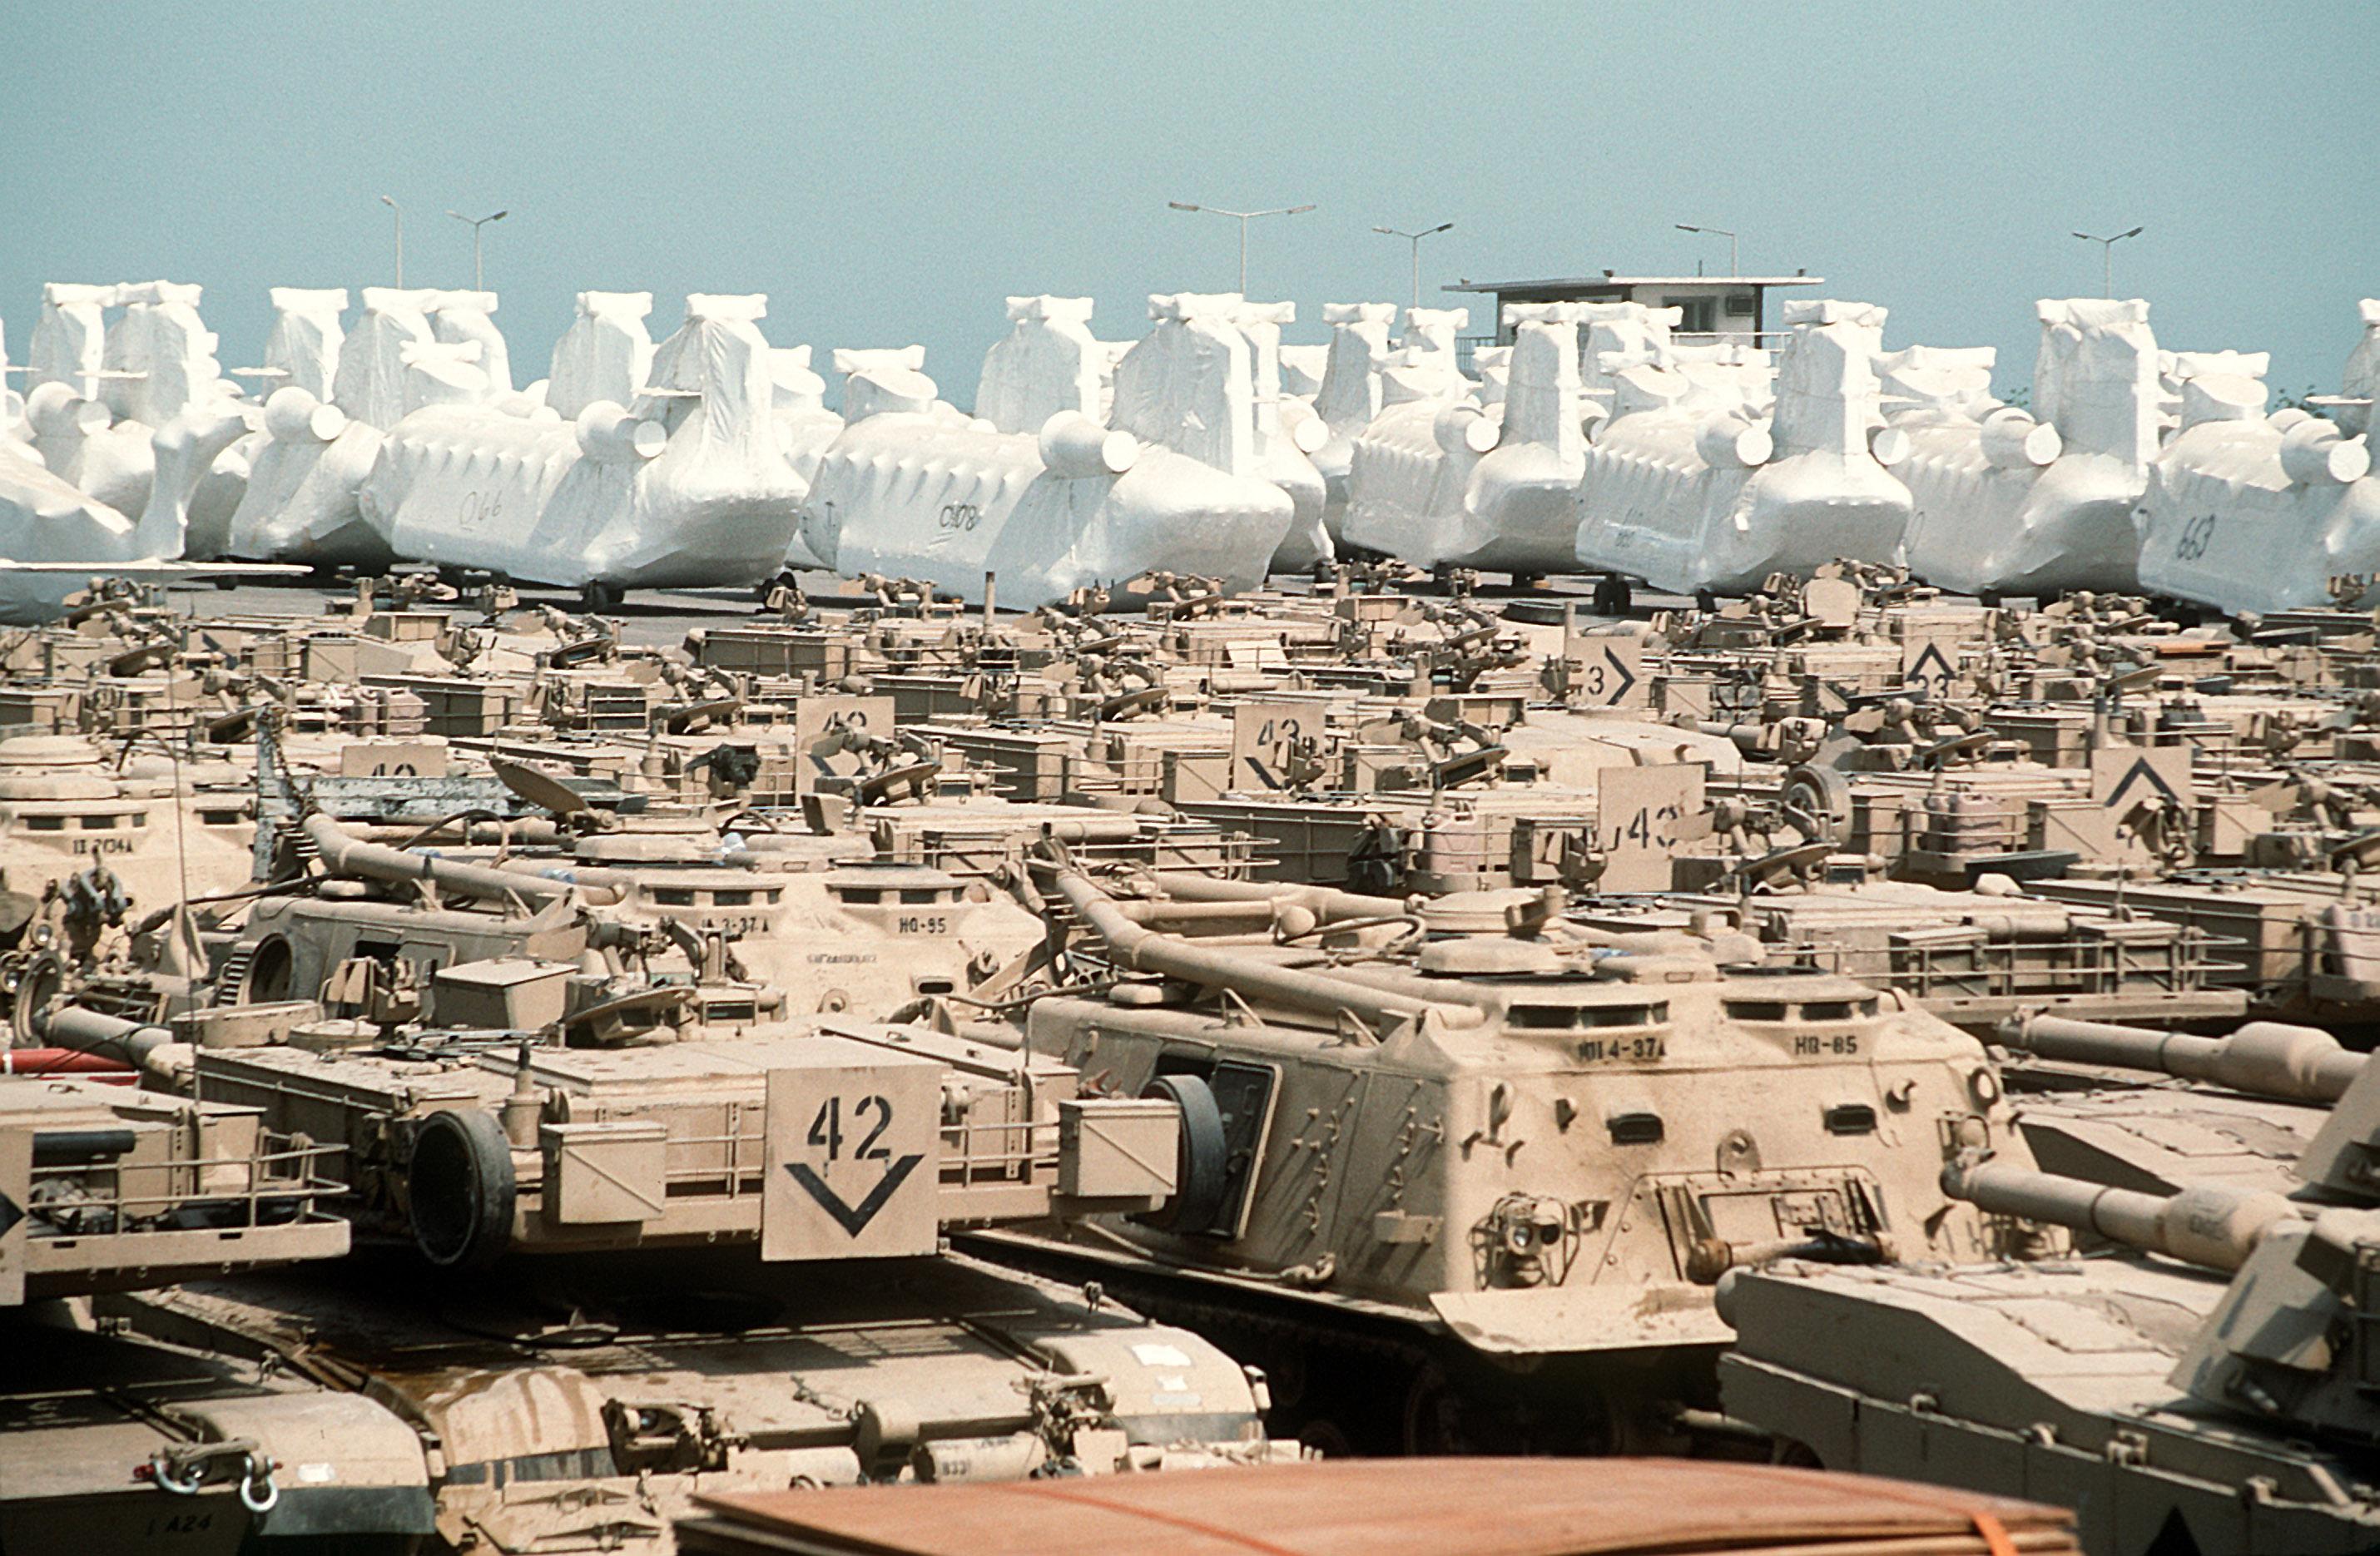 Guerre en Irak - Page 3 6061791439_c31b50e932_o